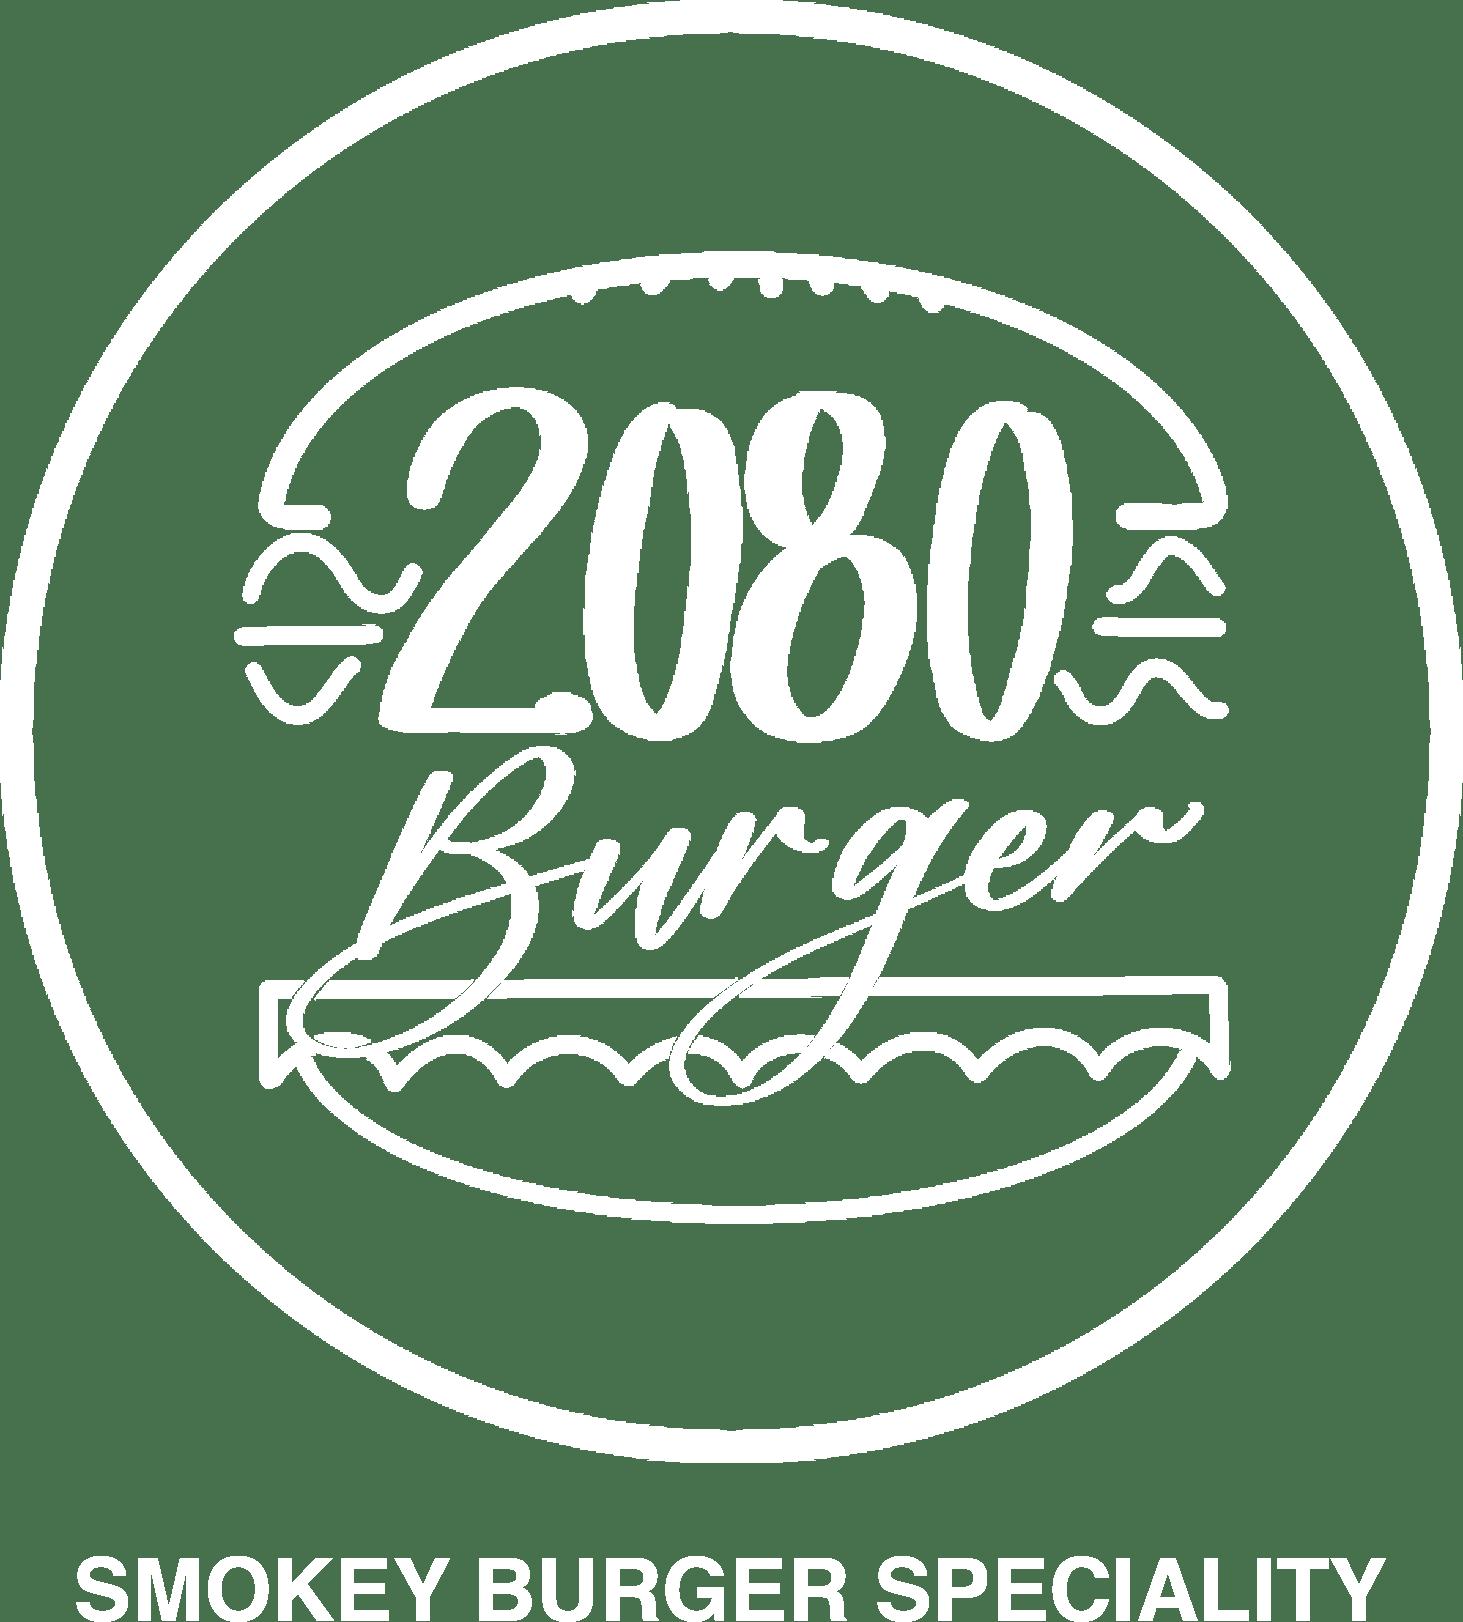 2080-burger-everplate-licensee-logo